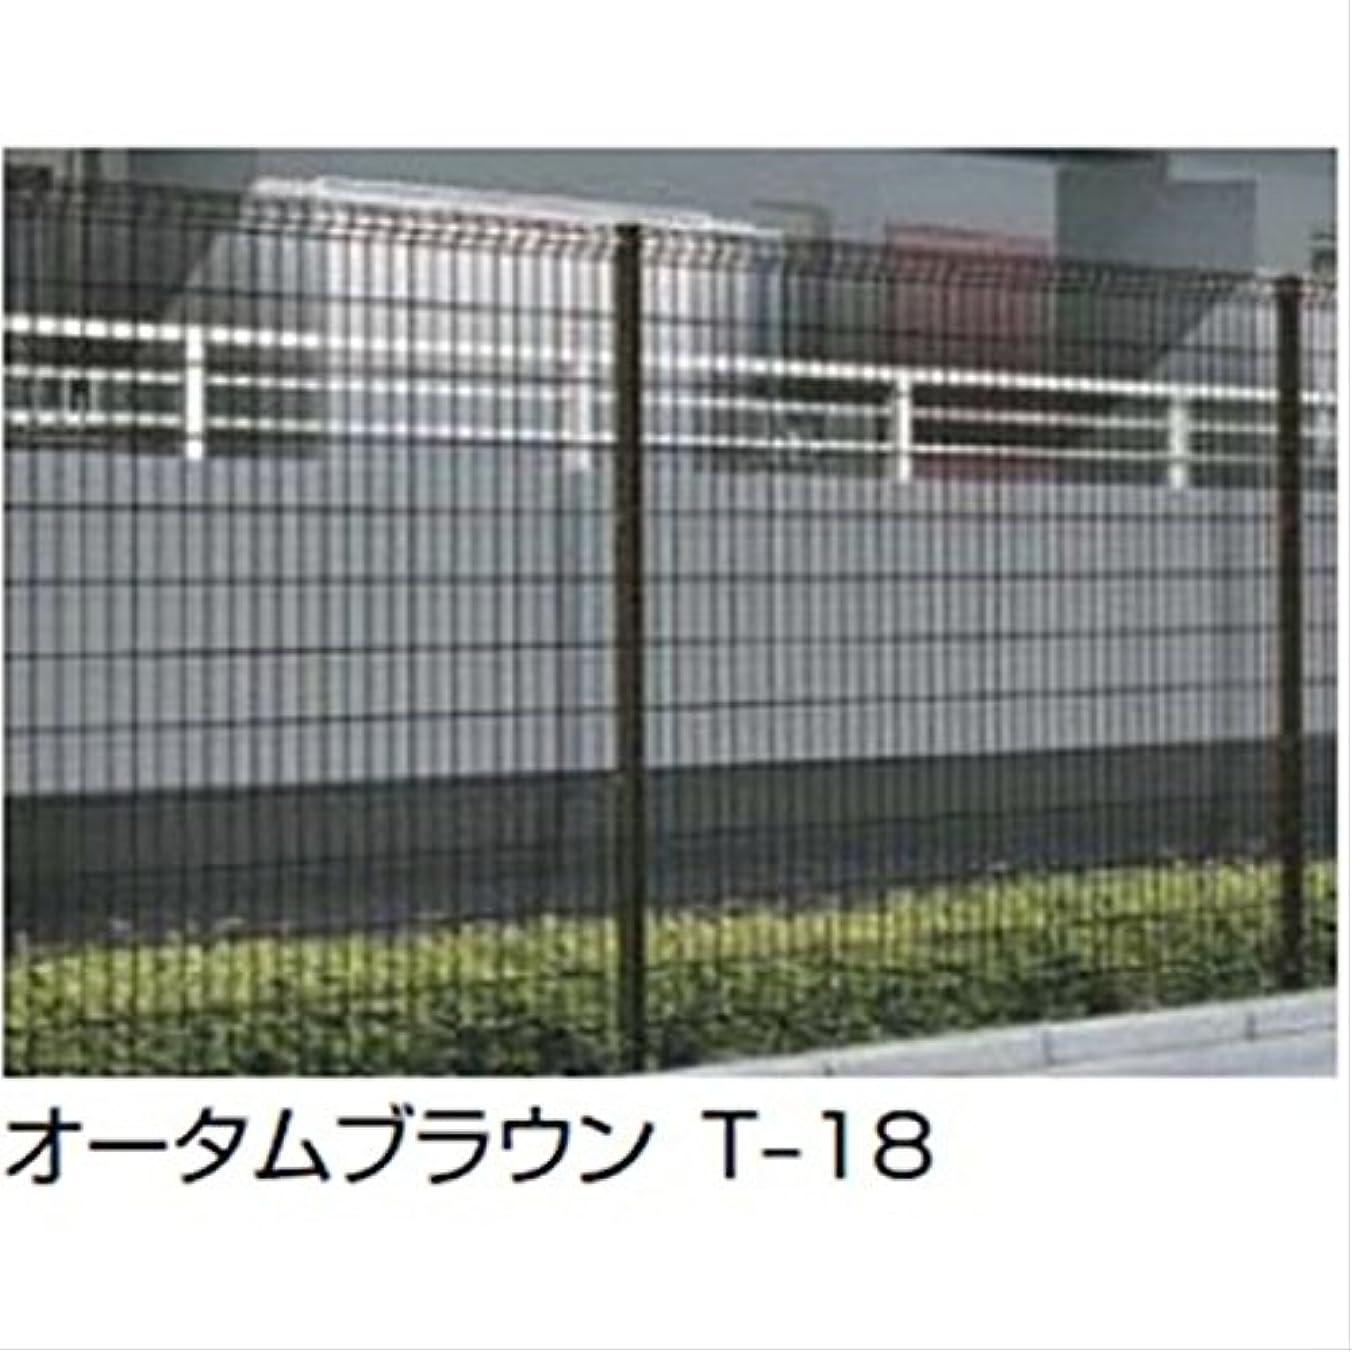 LIXIL TOEX ハイグリッドフェンスN8型 本体 T-15  【リクシル】 【スチールフェンス 柵】  ブラック